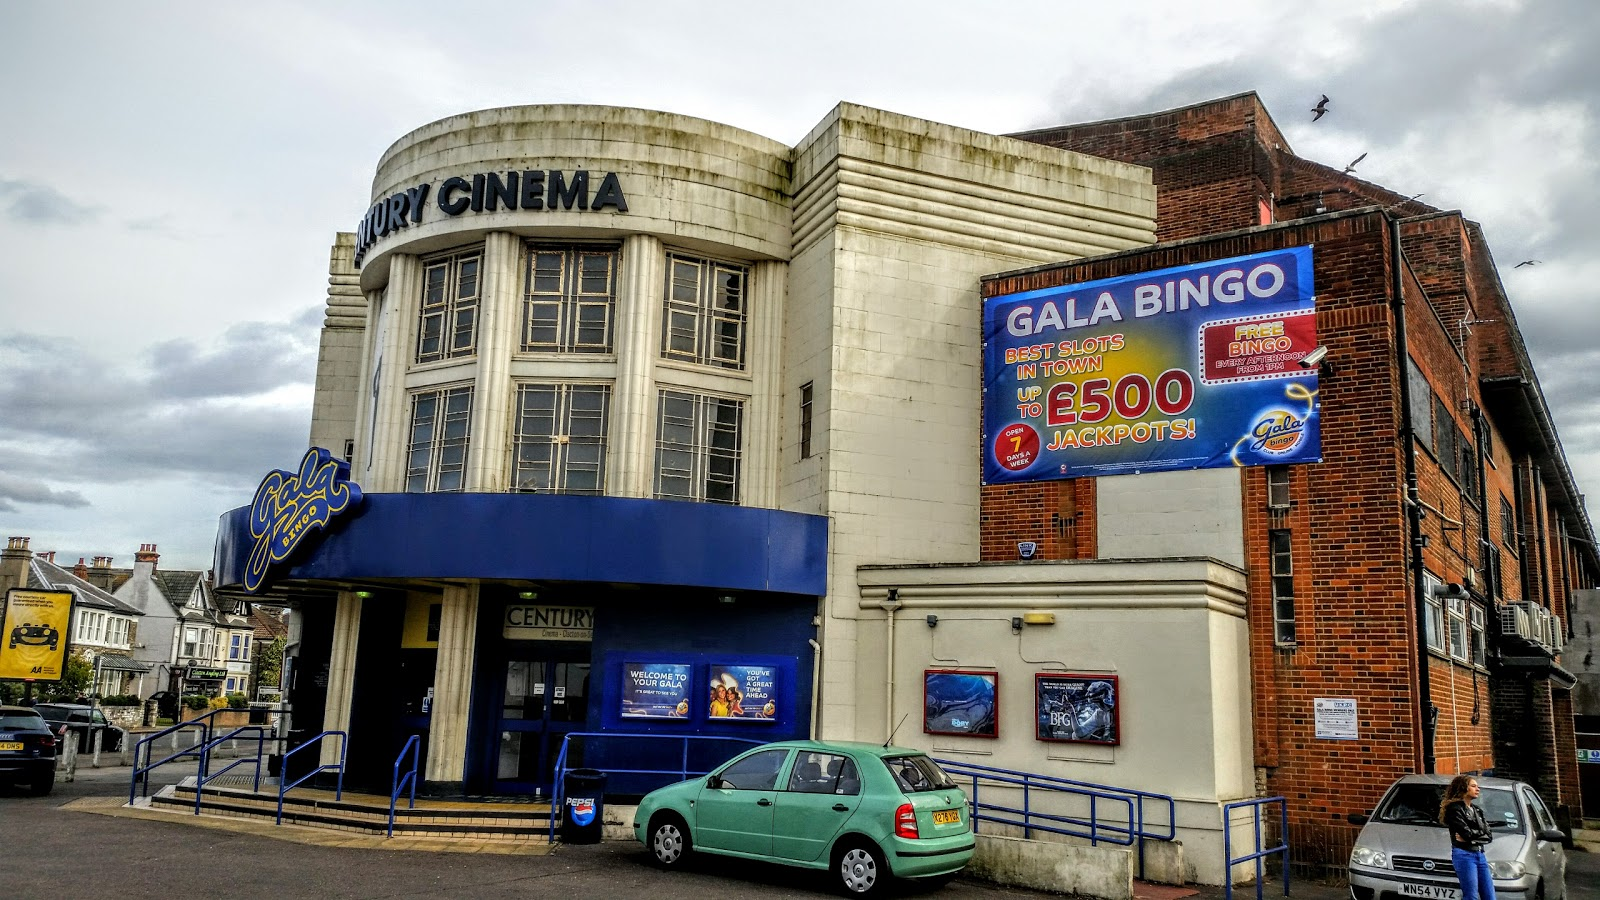 Visit Century Cinema on your trip to Clacton-on-Sea